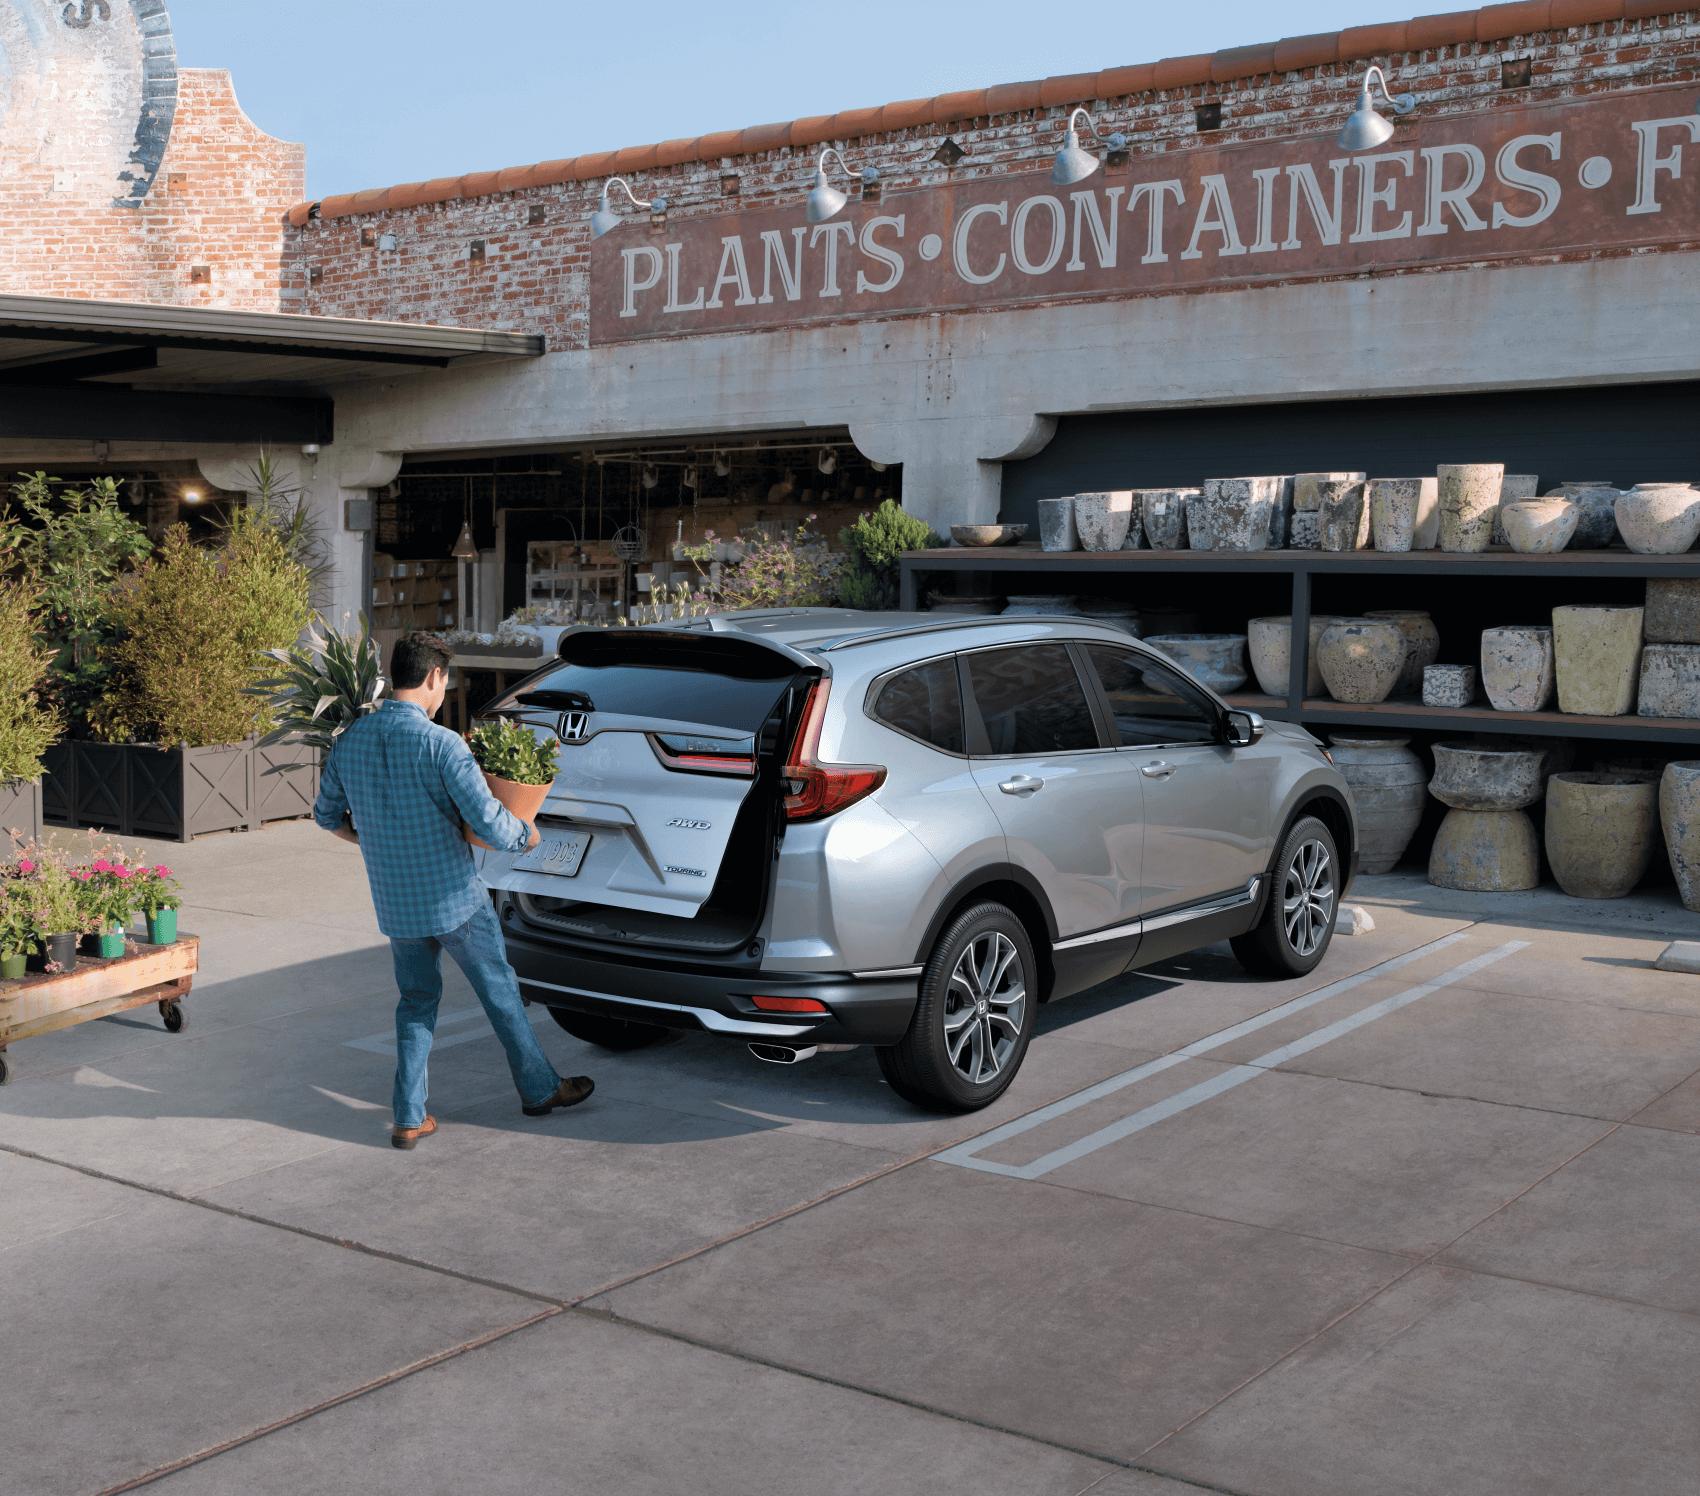 2020 Honda CR-V Silver Loading Plants Honda Dealer Torrance CA Norm Reeves Superstore